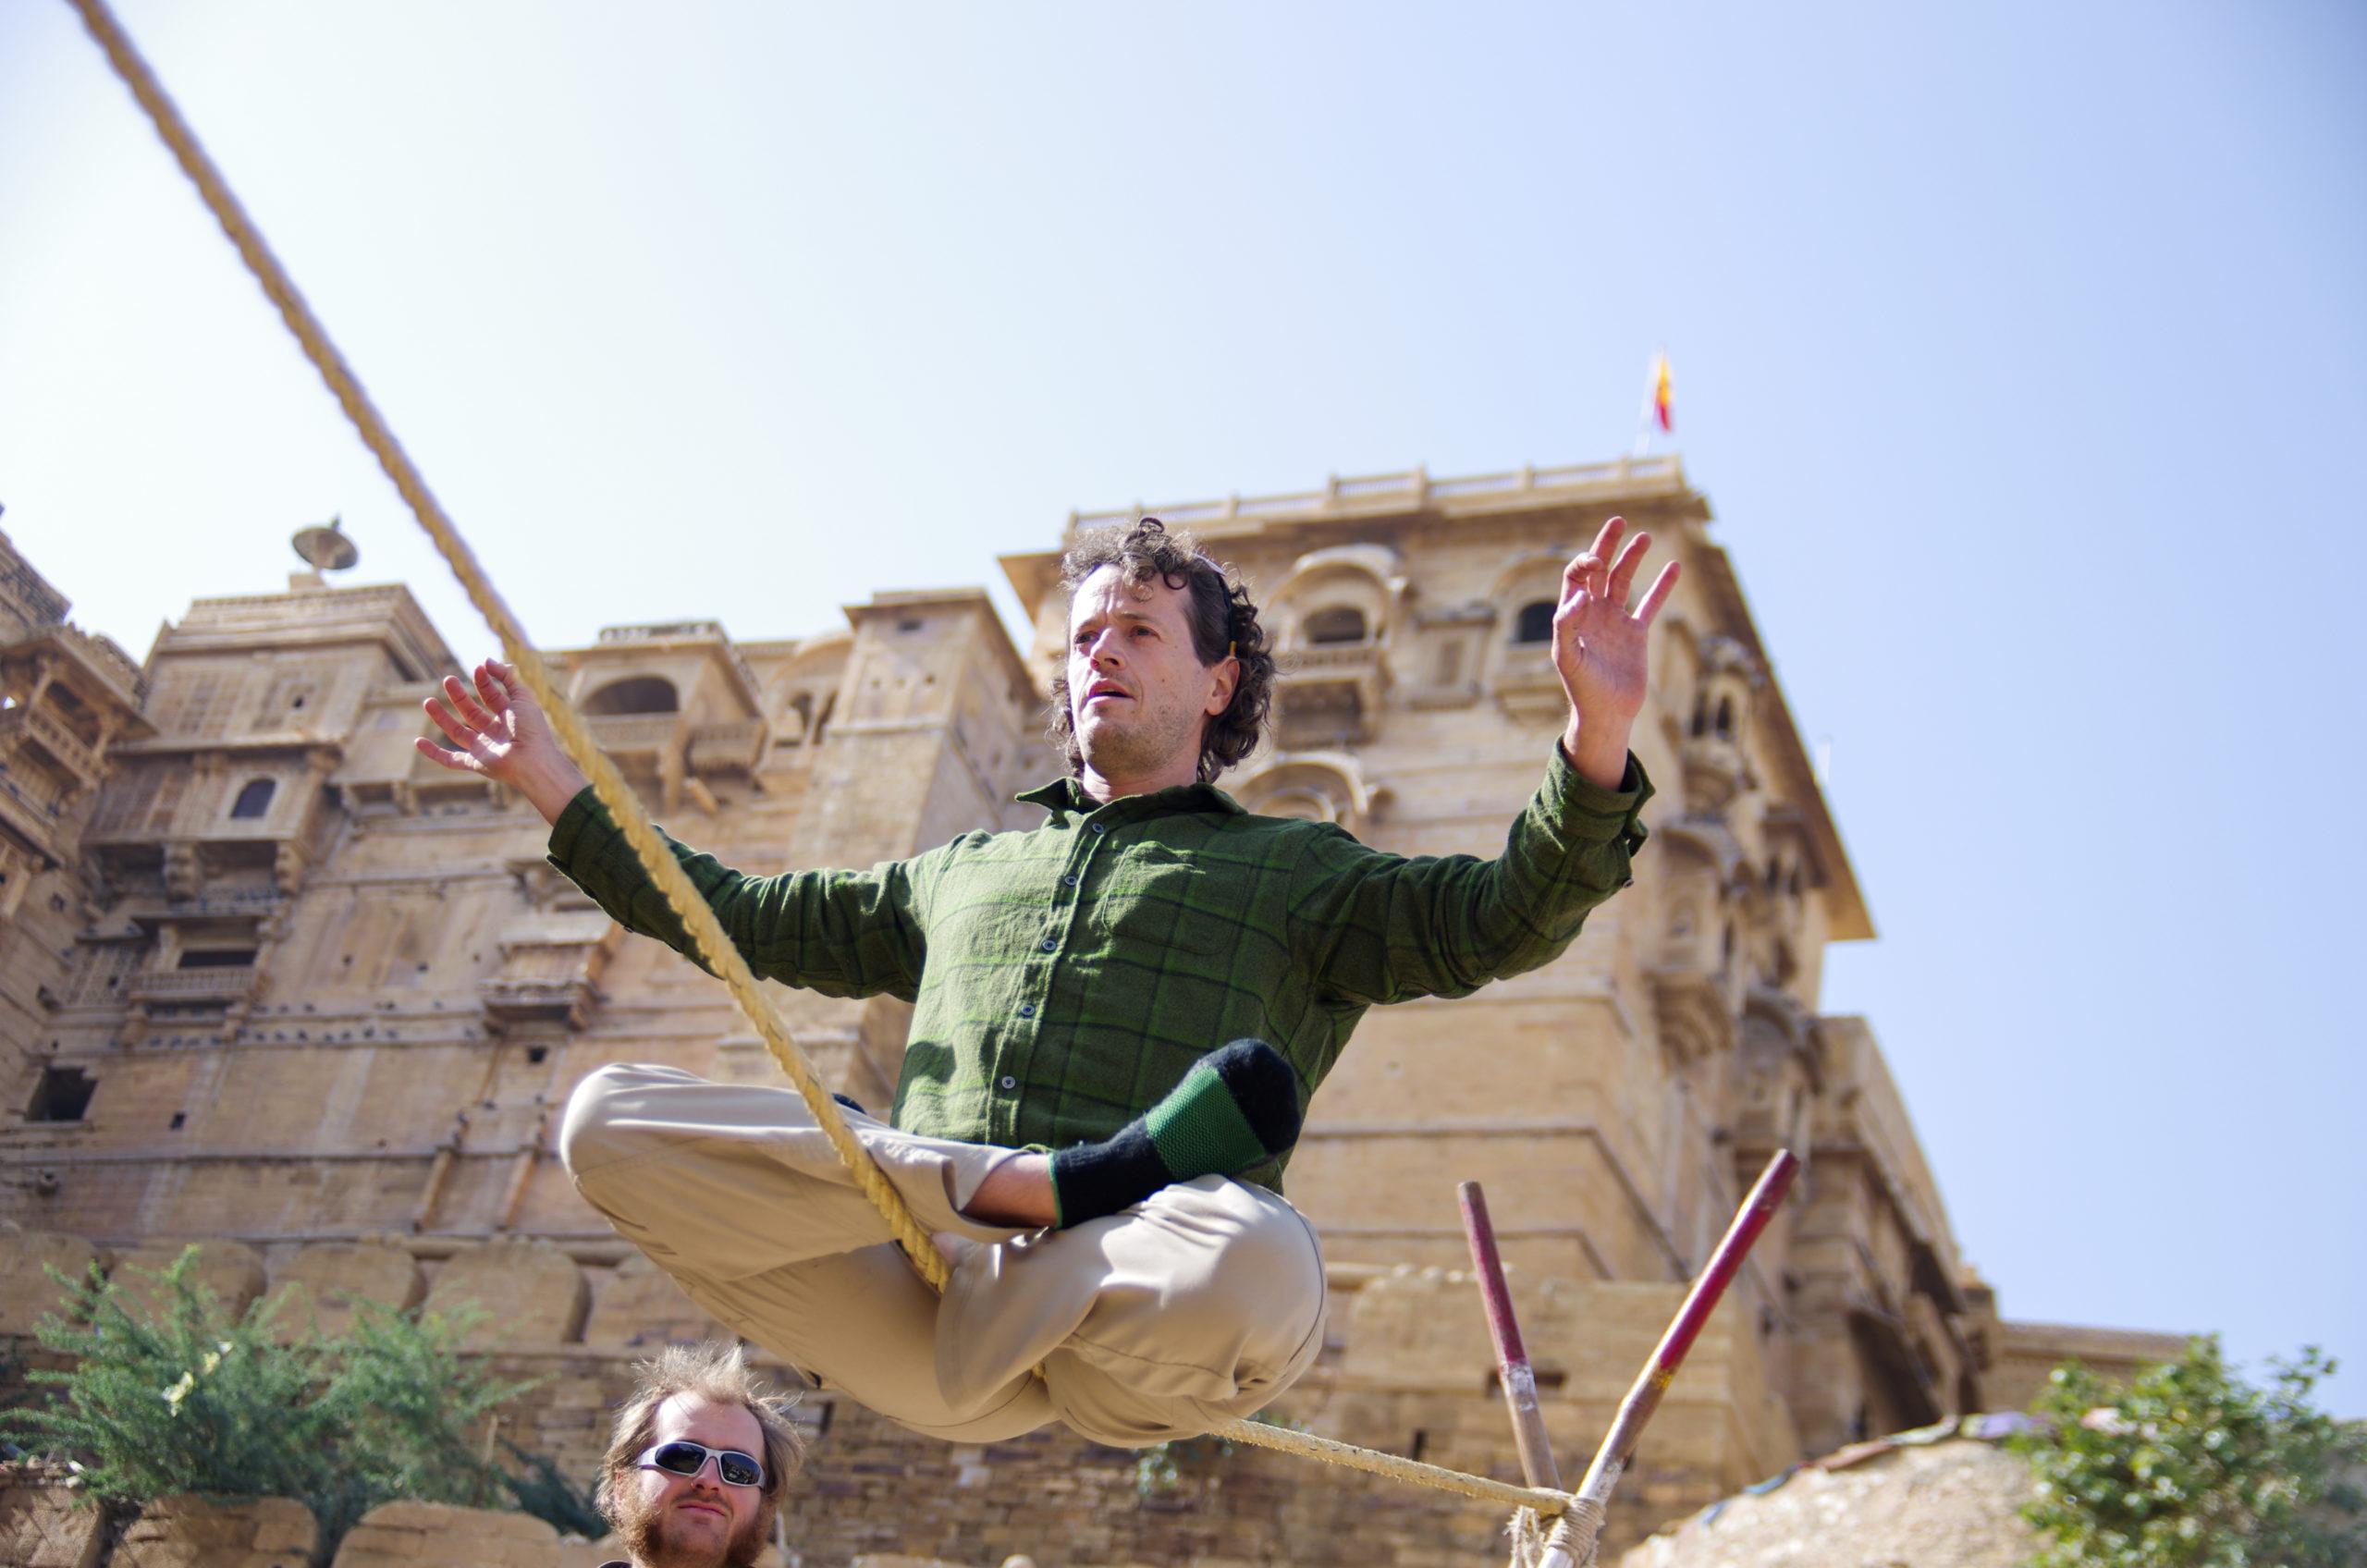 Jason Magness balancing on a slack rope